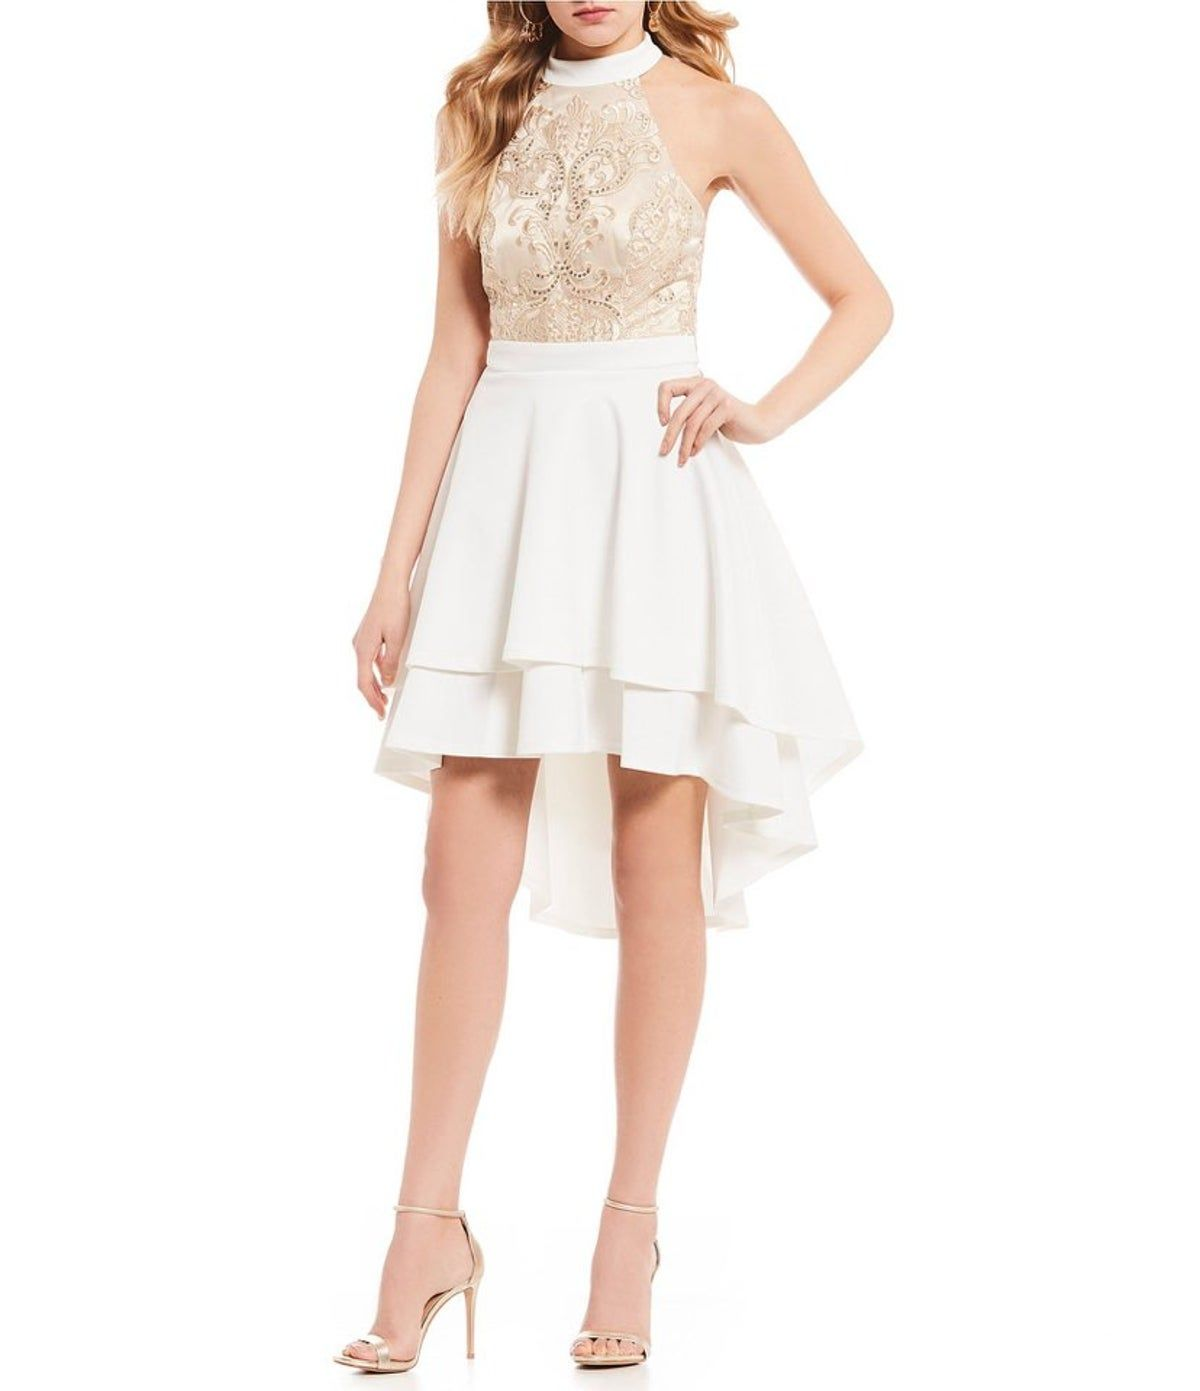 Pin by J-Hopes_ Gurl on School dance dresses  Cheap short prom